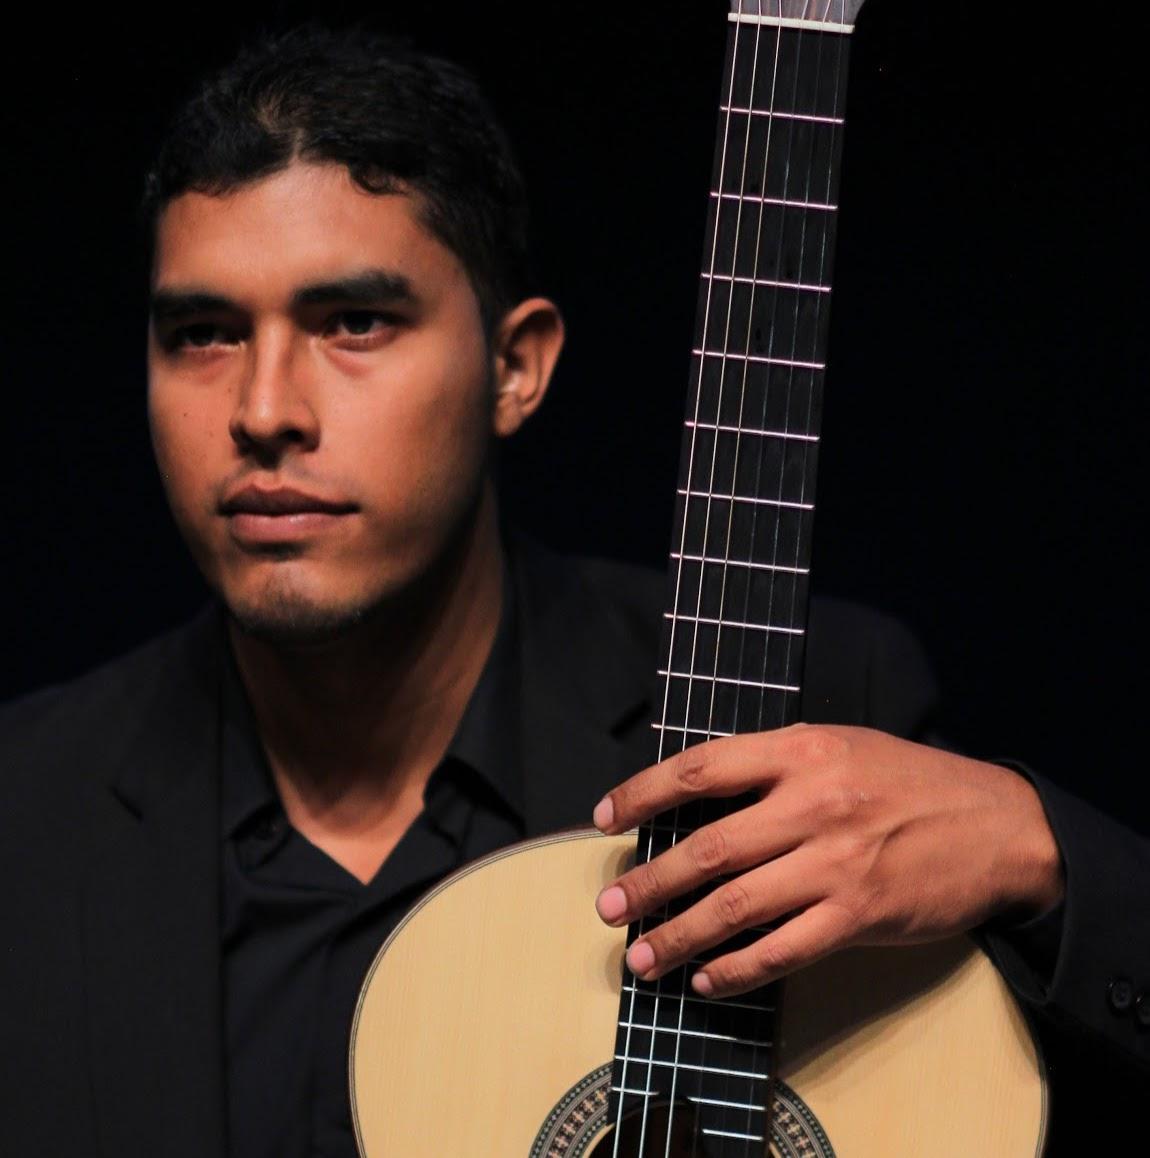 Vendredi 30 – 21h à 22h – Guitare à la Maison Carlos Restrepo Colombie